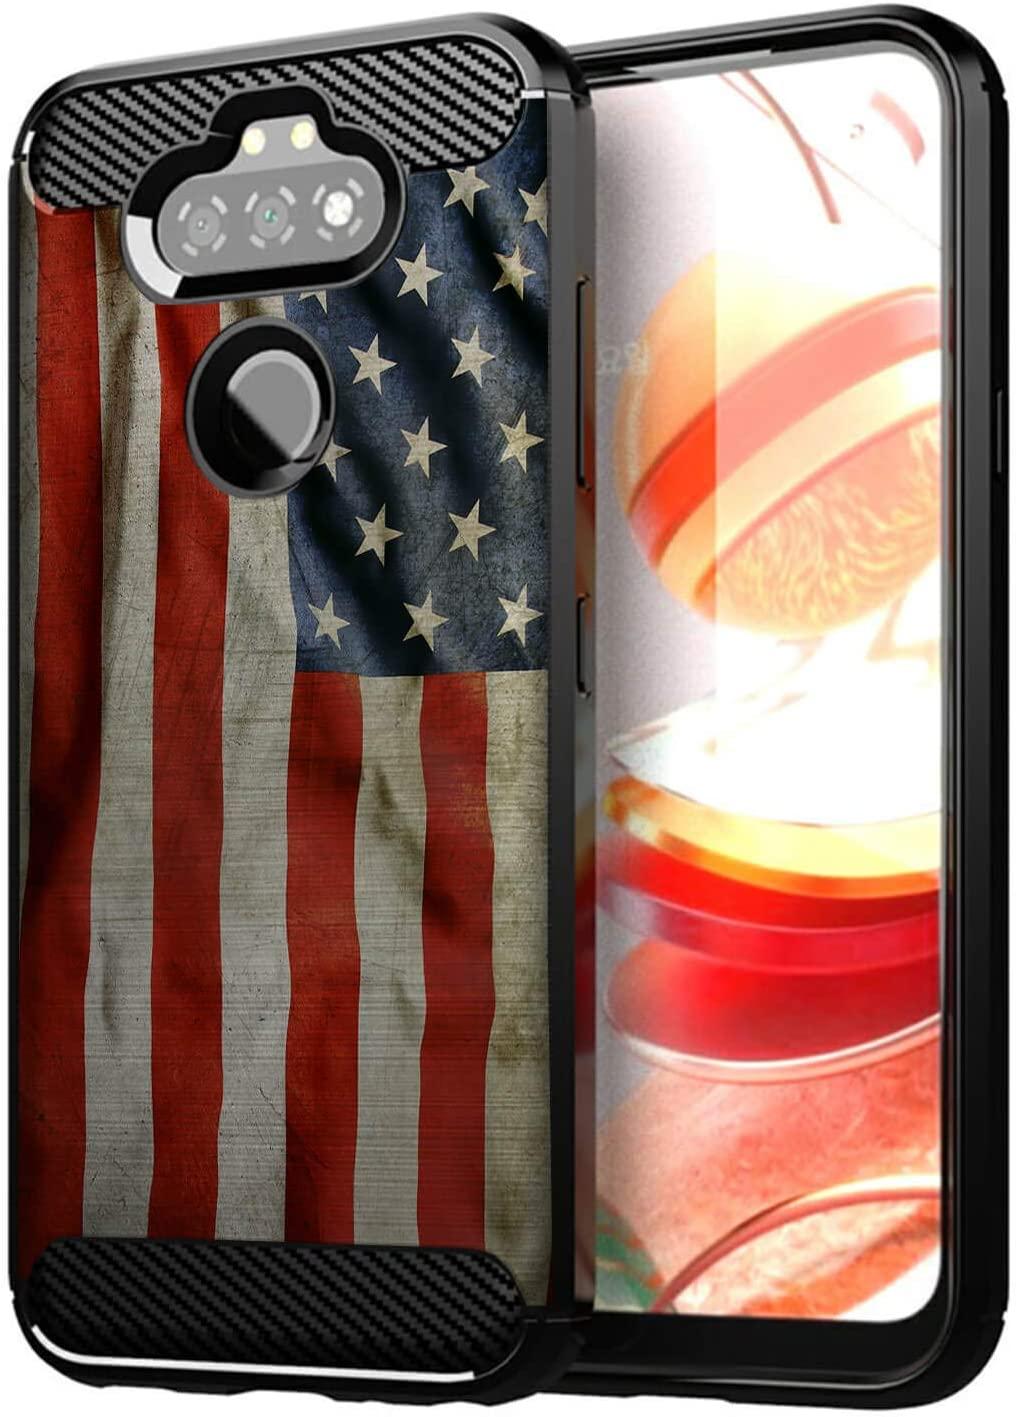 CasesonDeck Slim Case Compatible with [LG Aristo 5/ Fortune 3/ Tribute Monarch/ K31/ Phoenix 5 Case] Thin Scratch Preventing TPU, Matte Finish Carbon Fiber Texture Edges (American Flag)